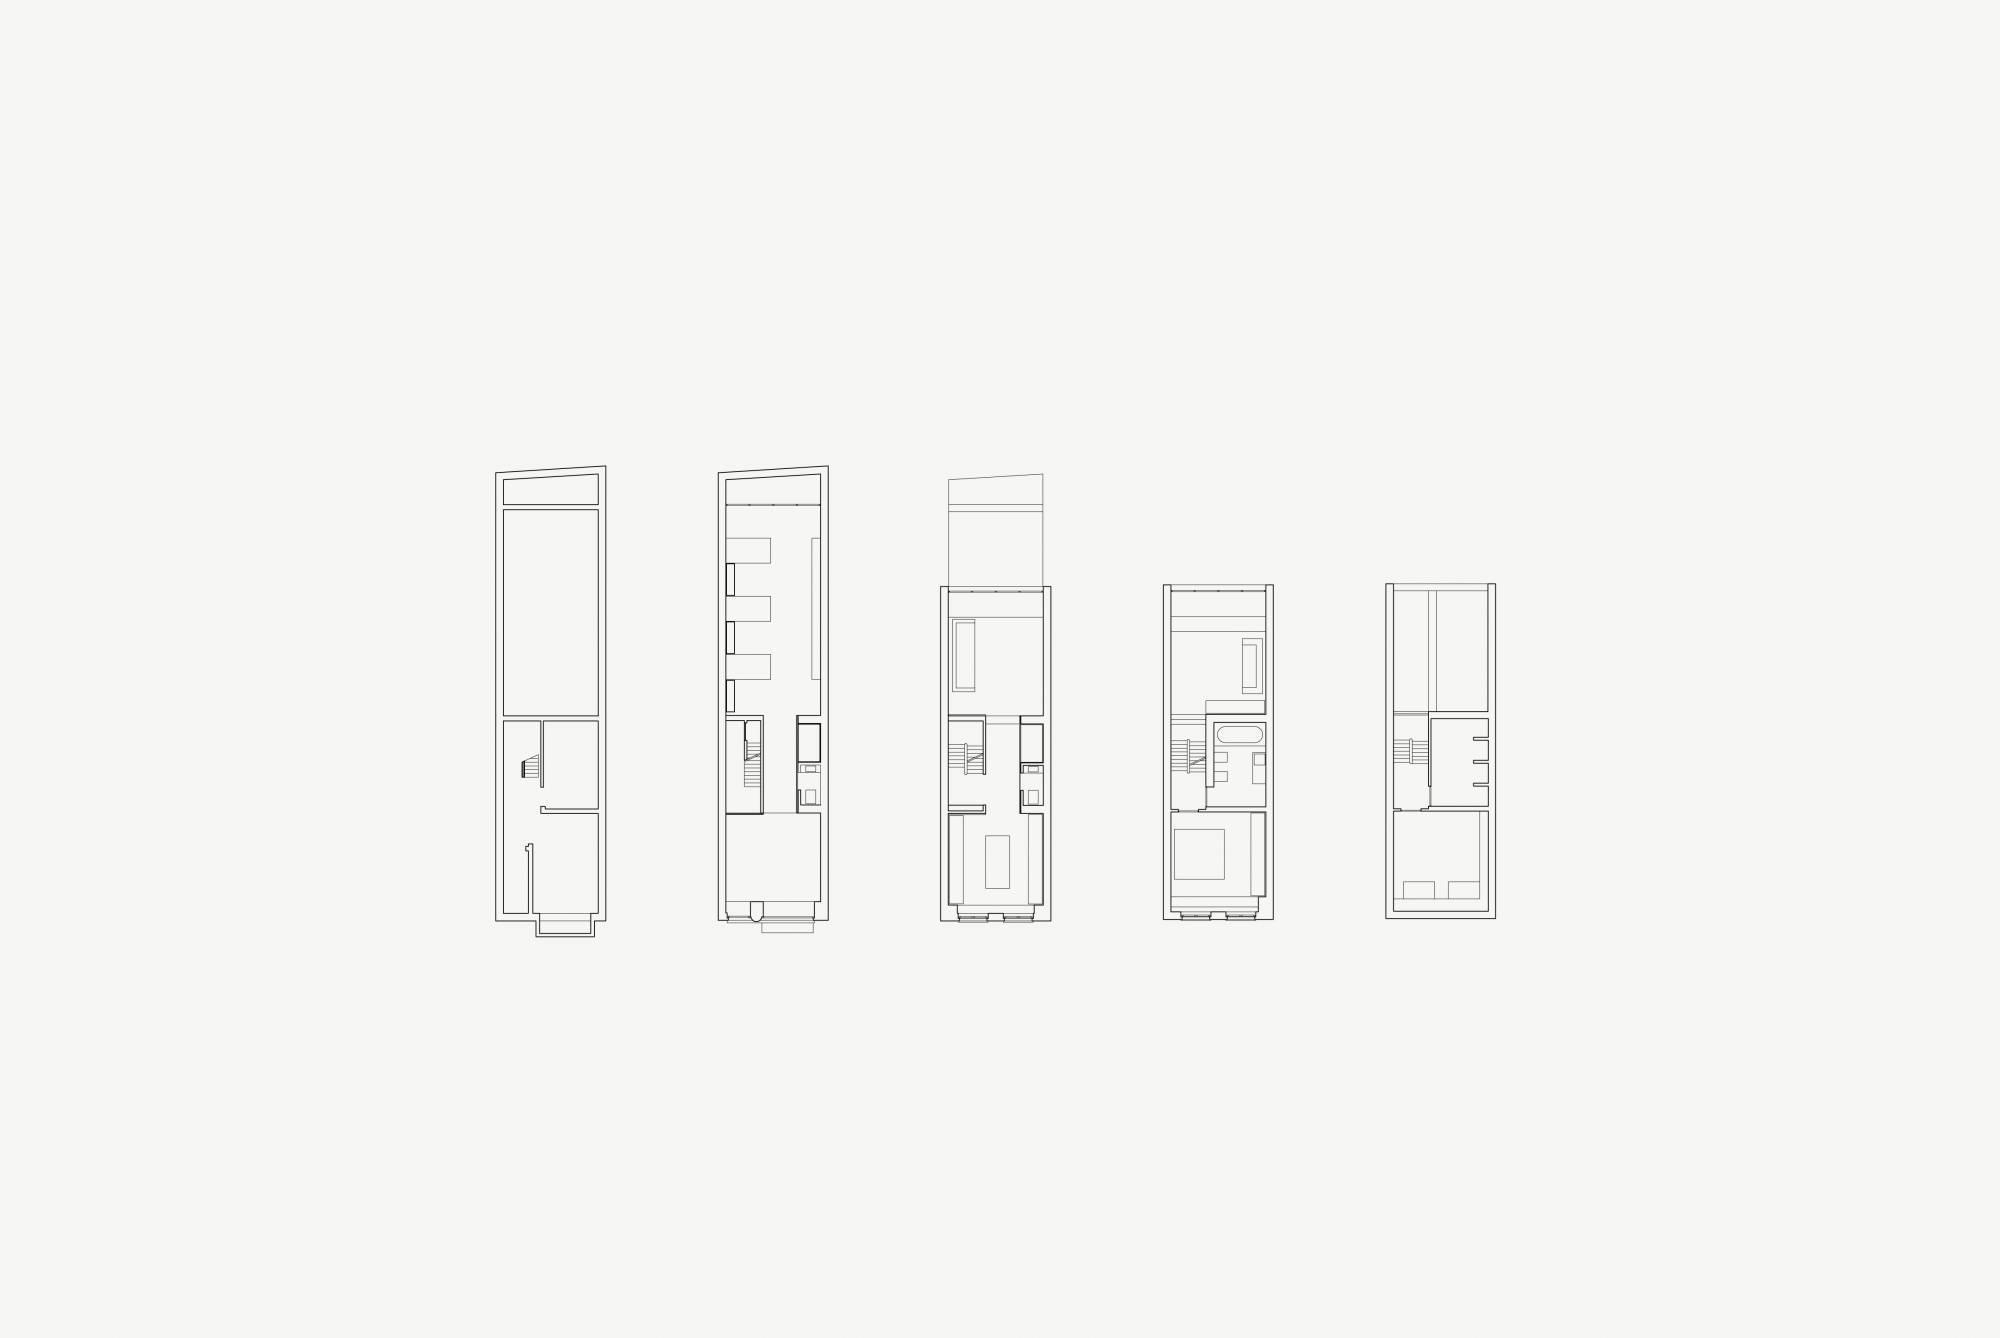 VVDA_RA Residence_Presentation Plans_1